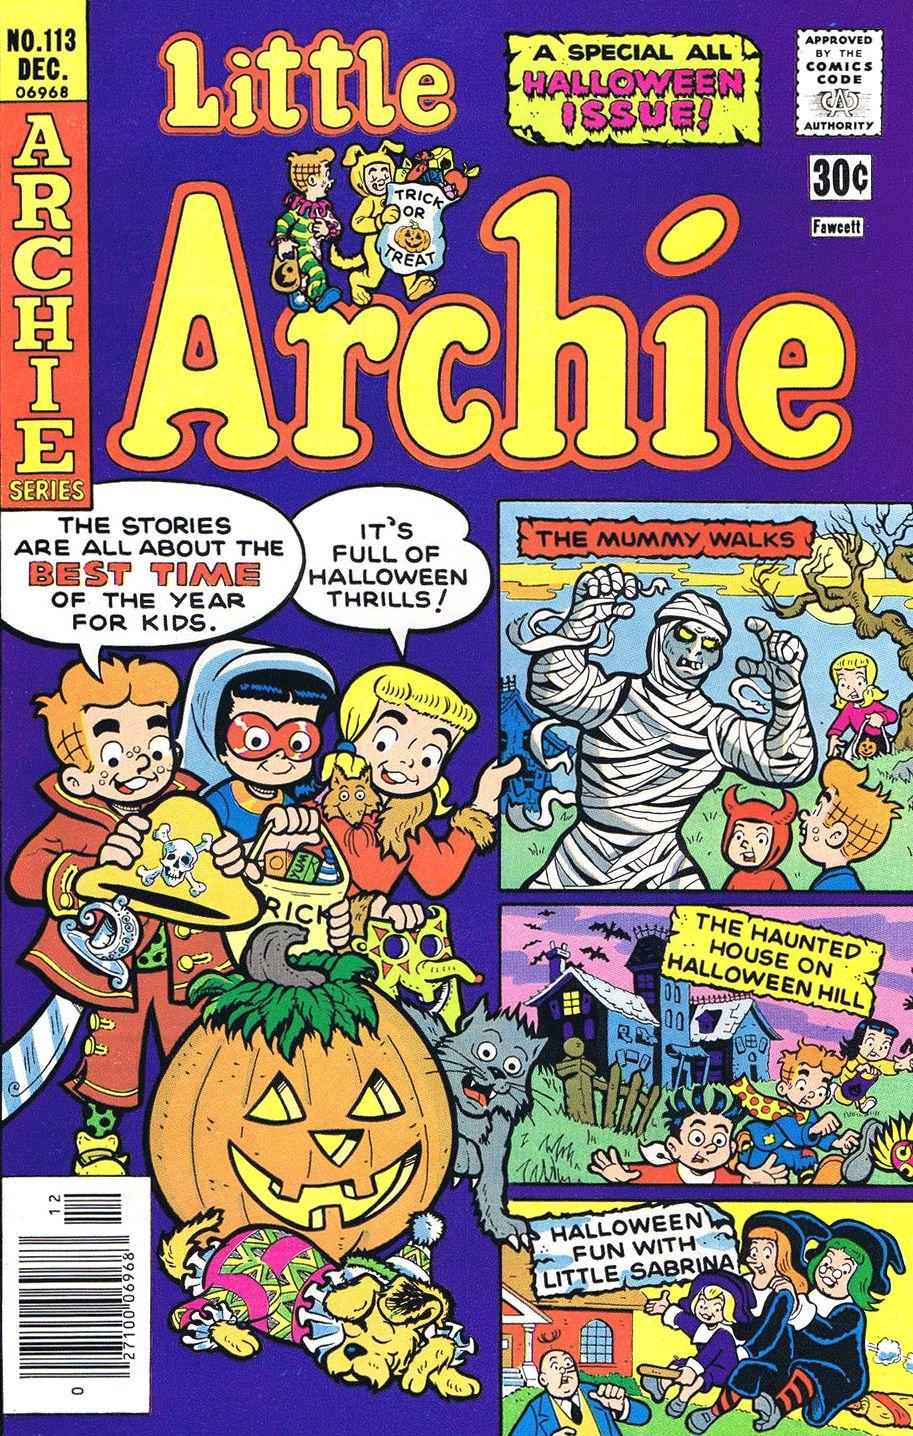 Little Archie #113, December 1976 #HalloweenComic